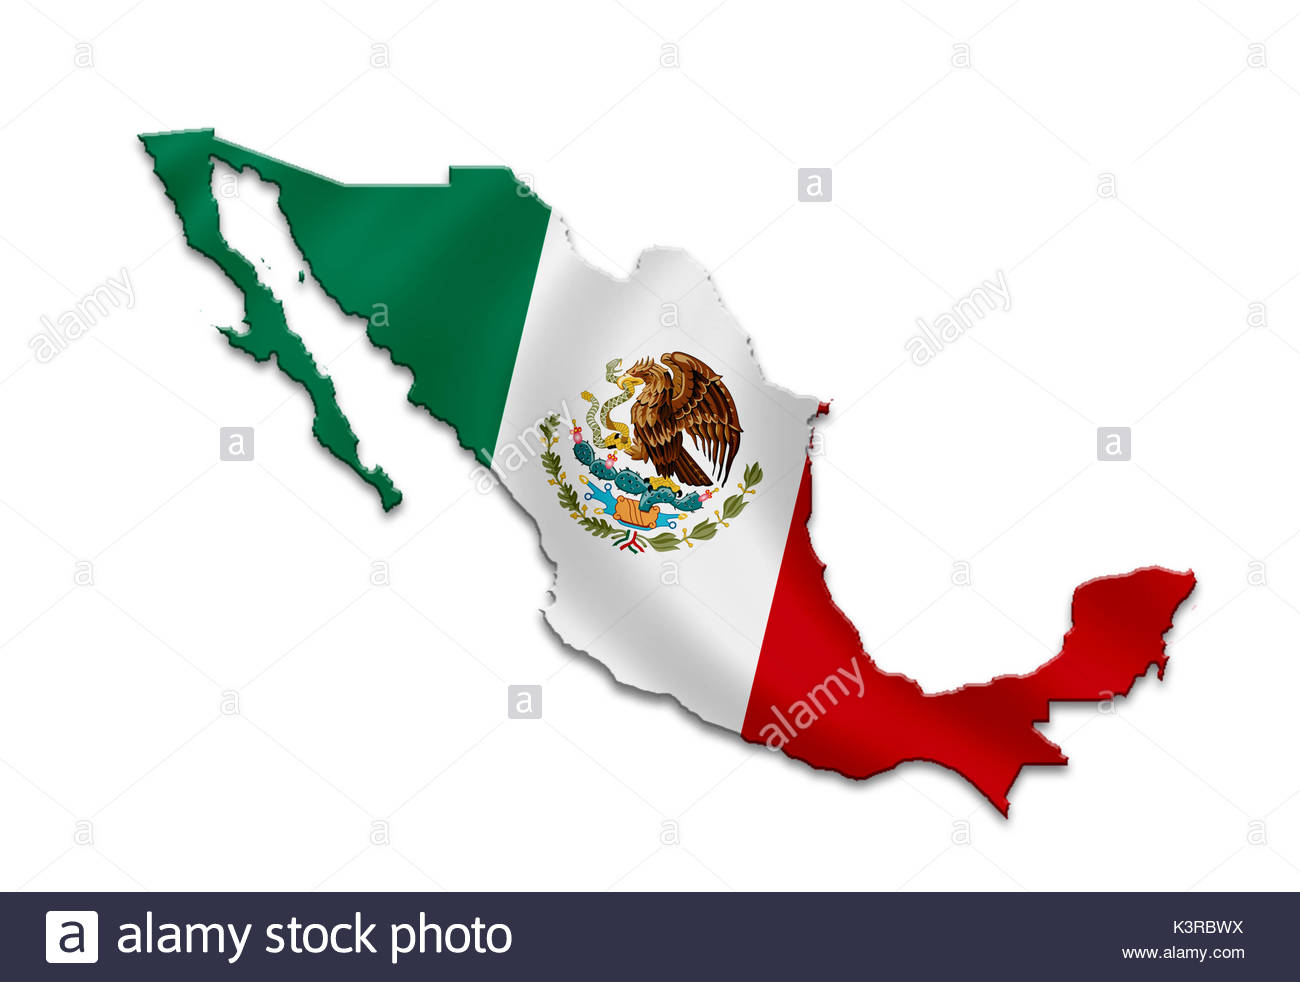 Mexico - map icon - Stock Image